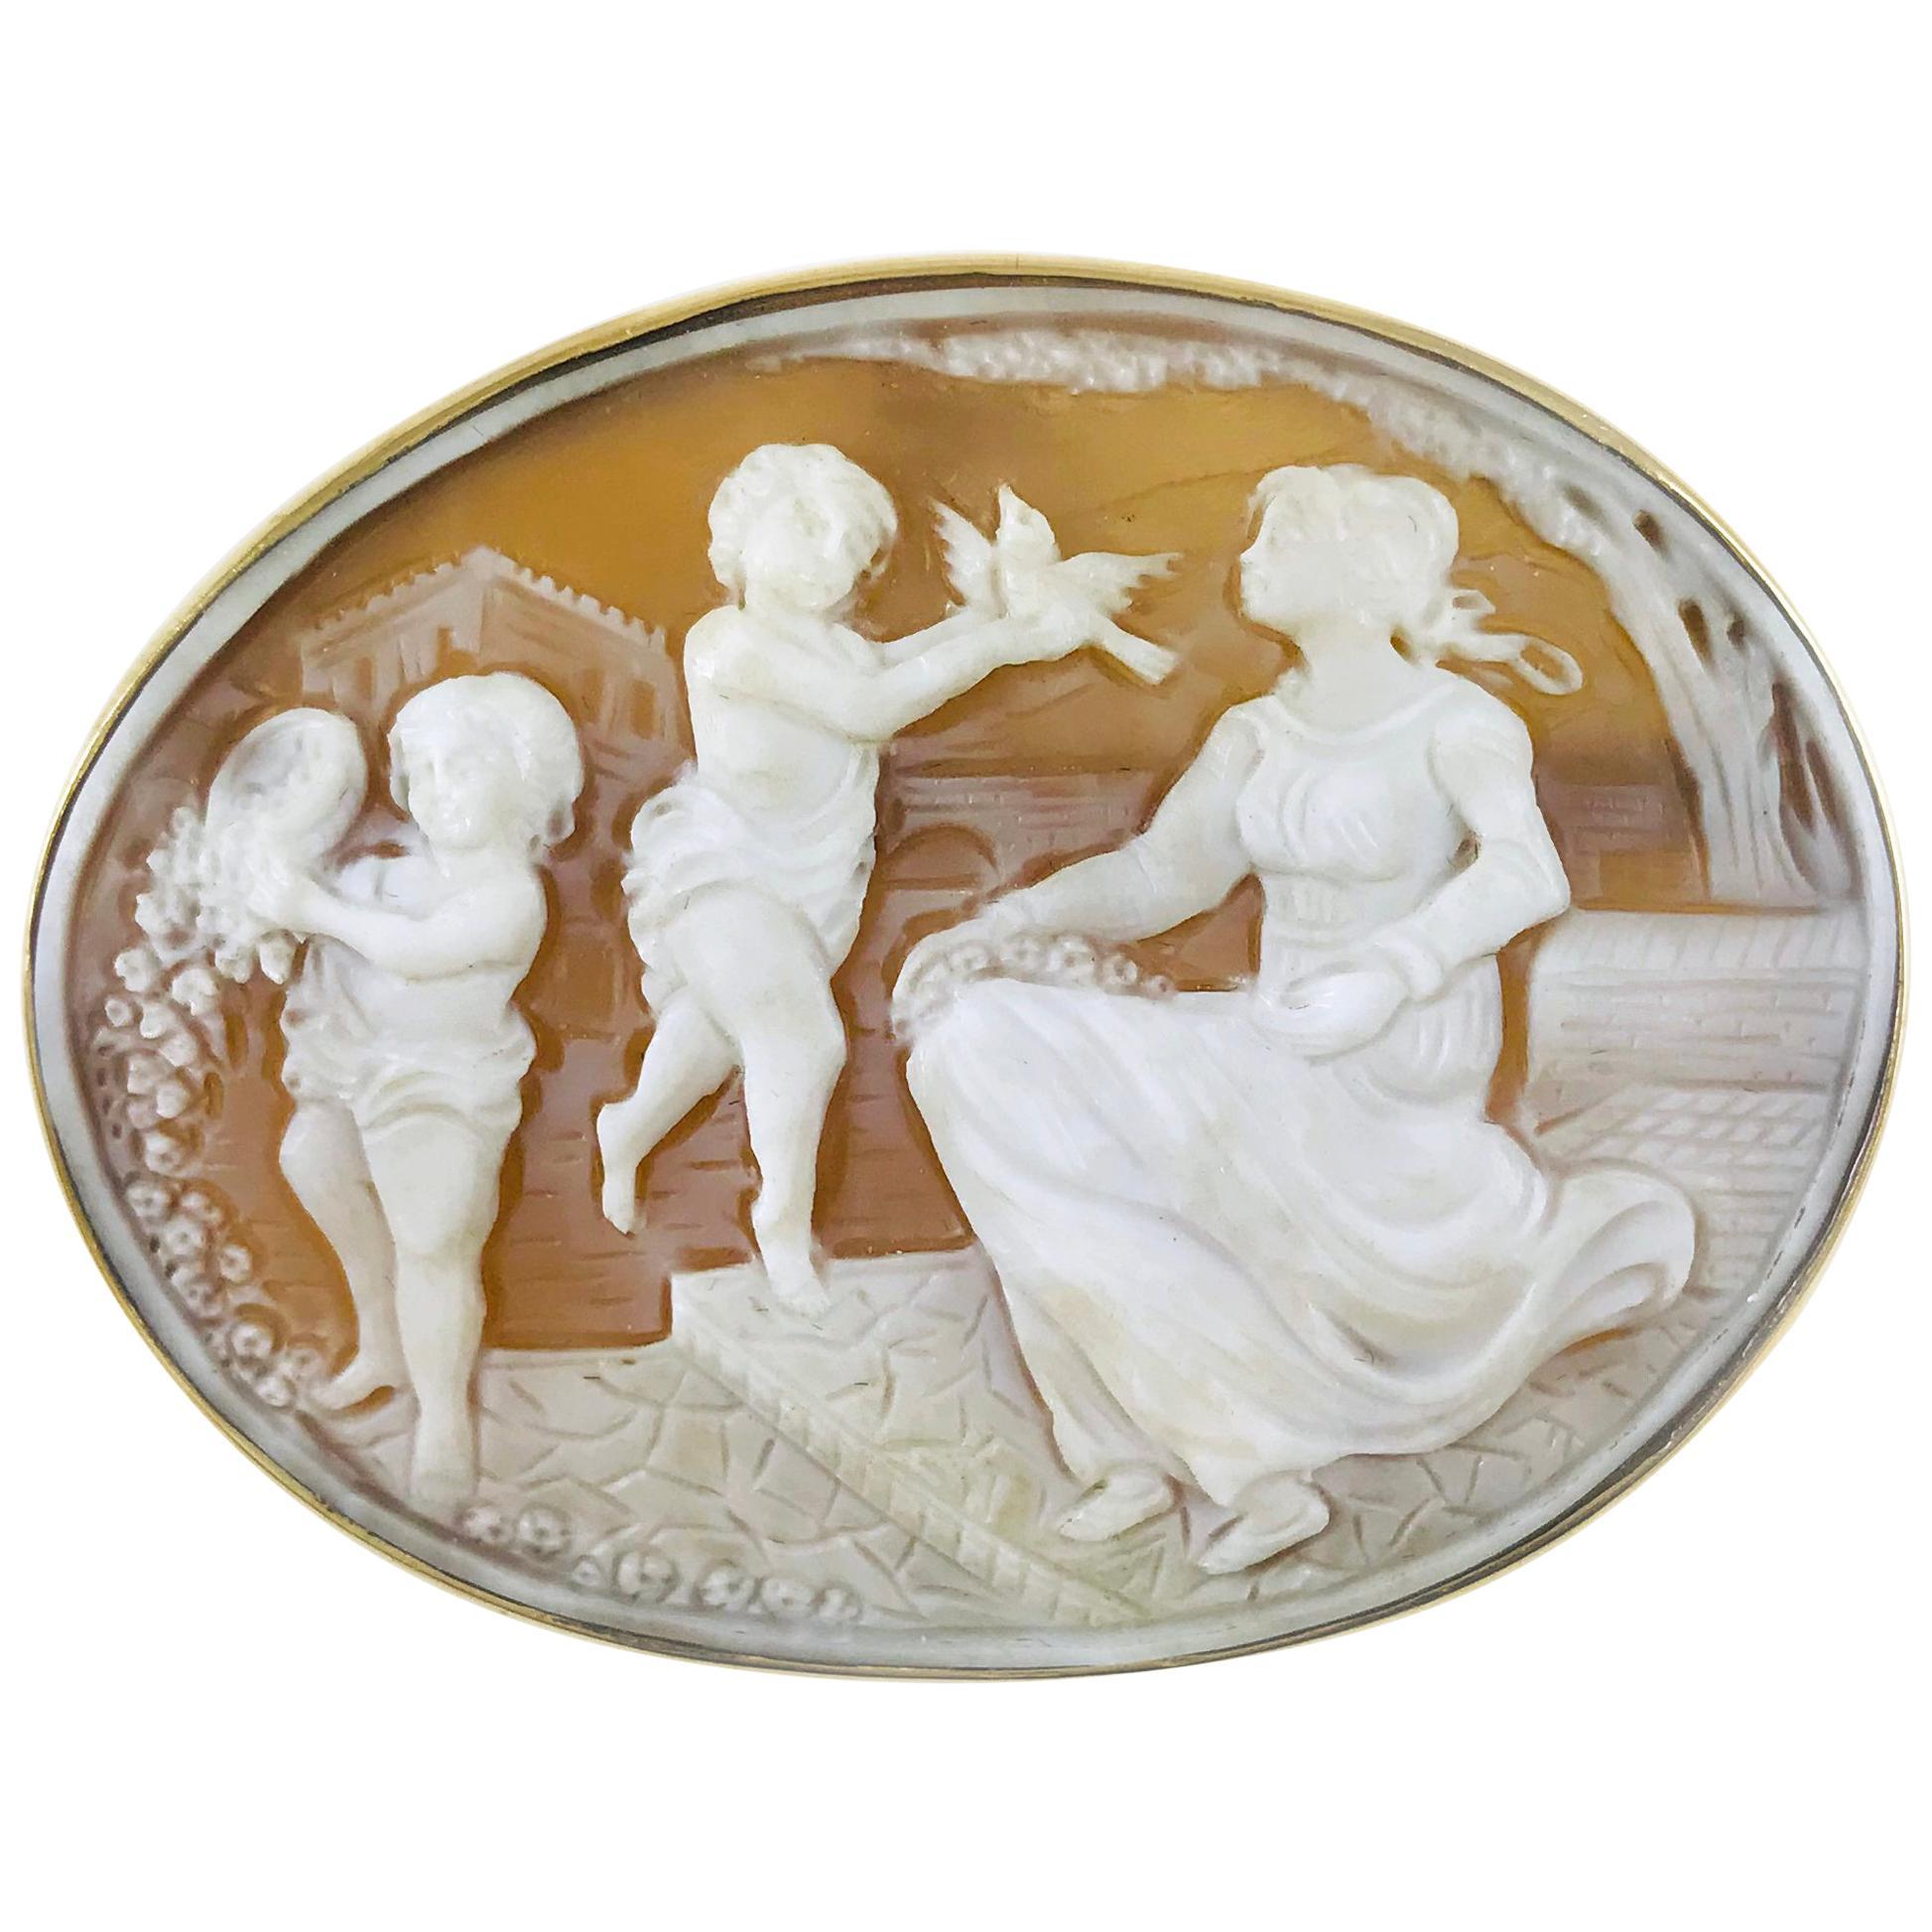 14 Karat Gold Shell Cameo Brooch Pendant, Mother and Children